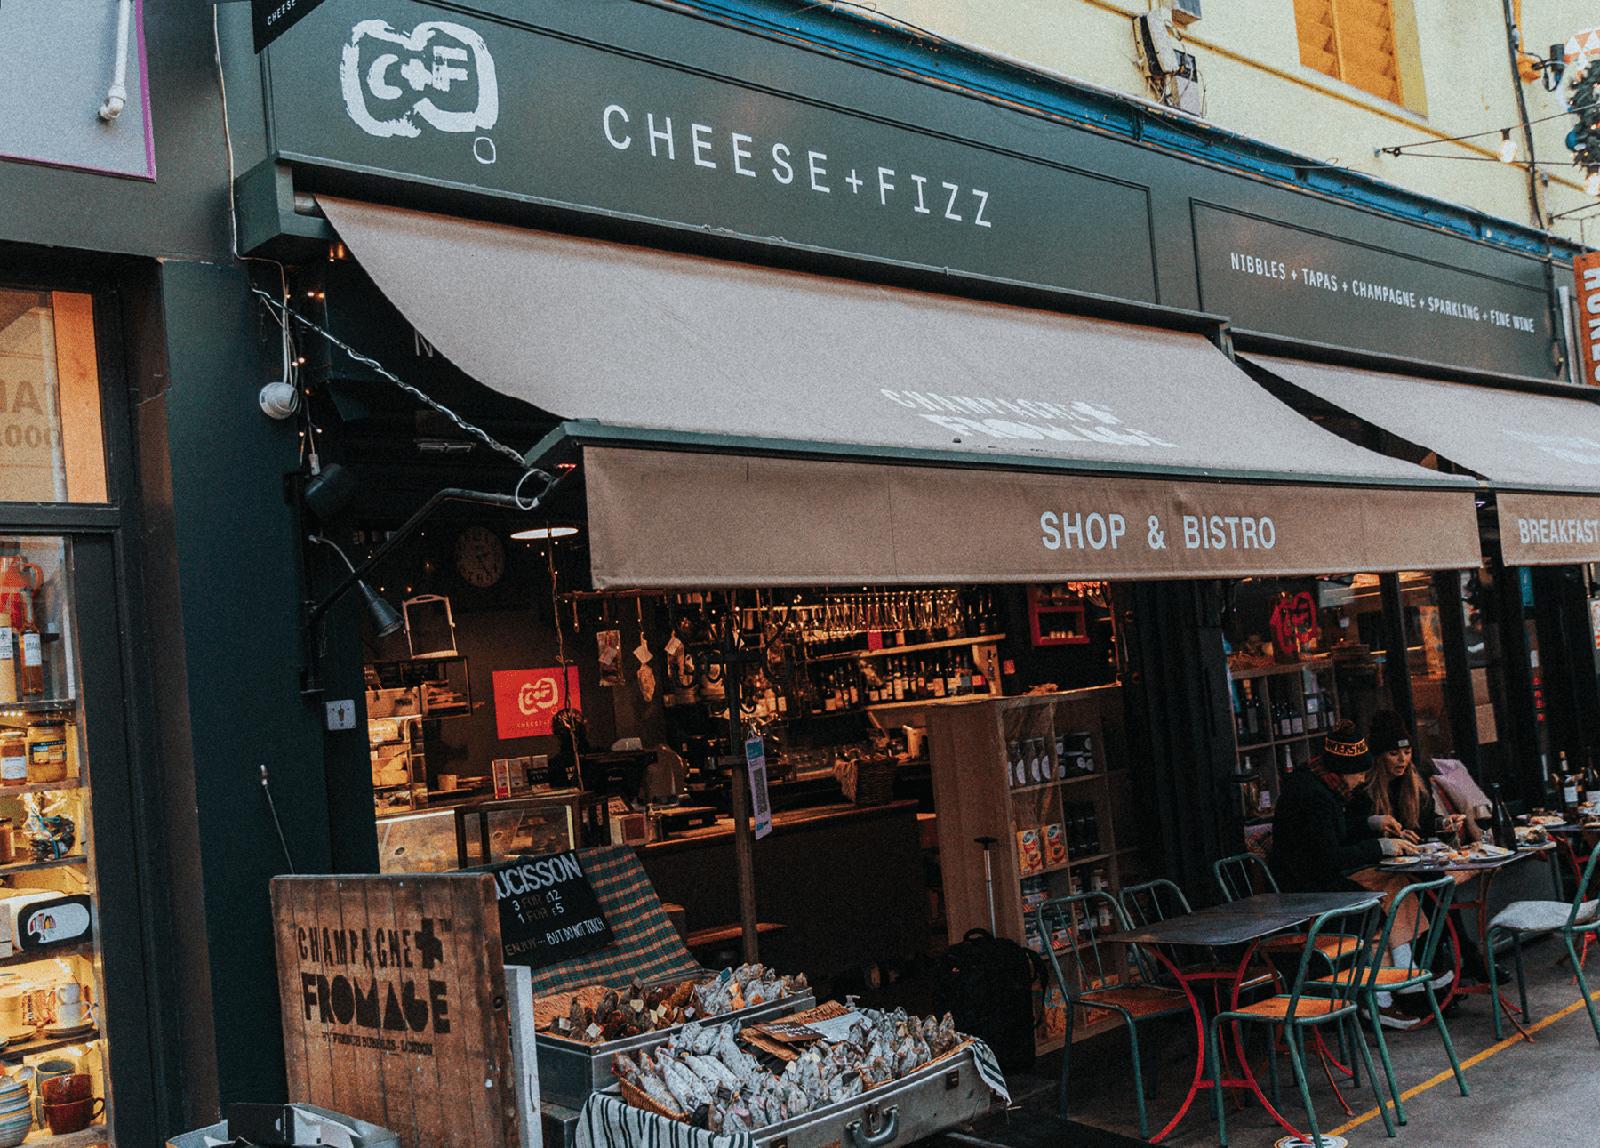 Cheese + Fizz - Brixton - Shop & Bistrot